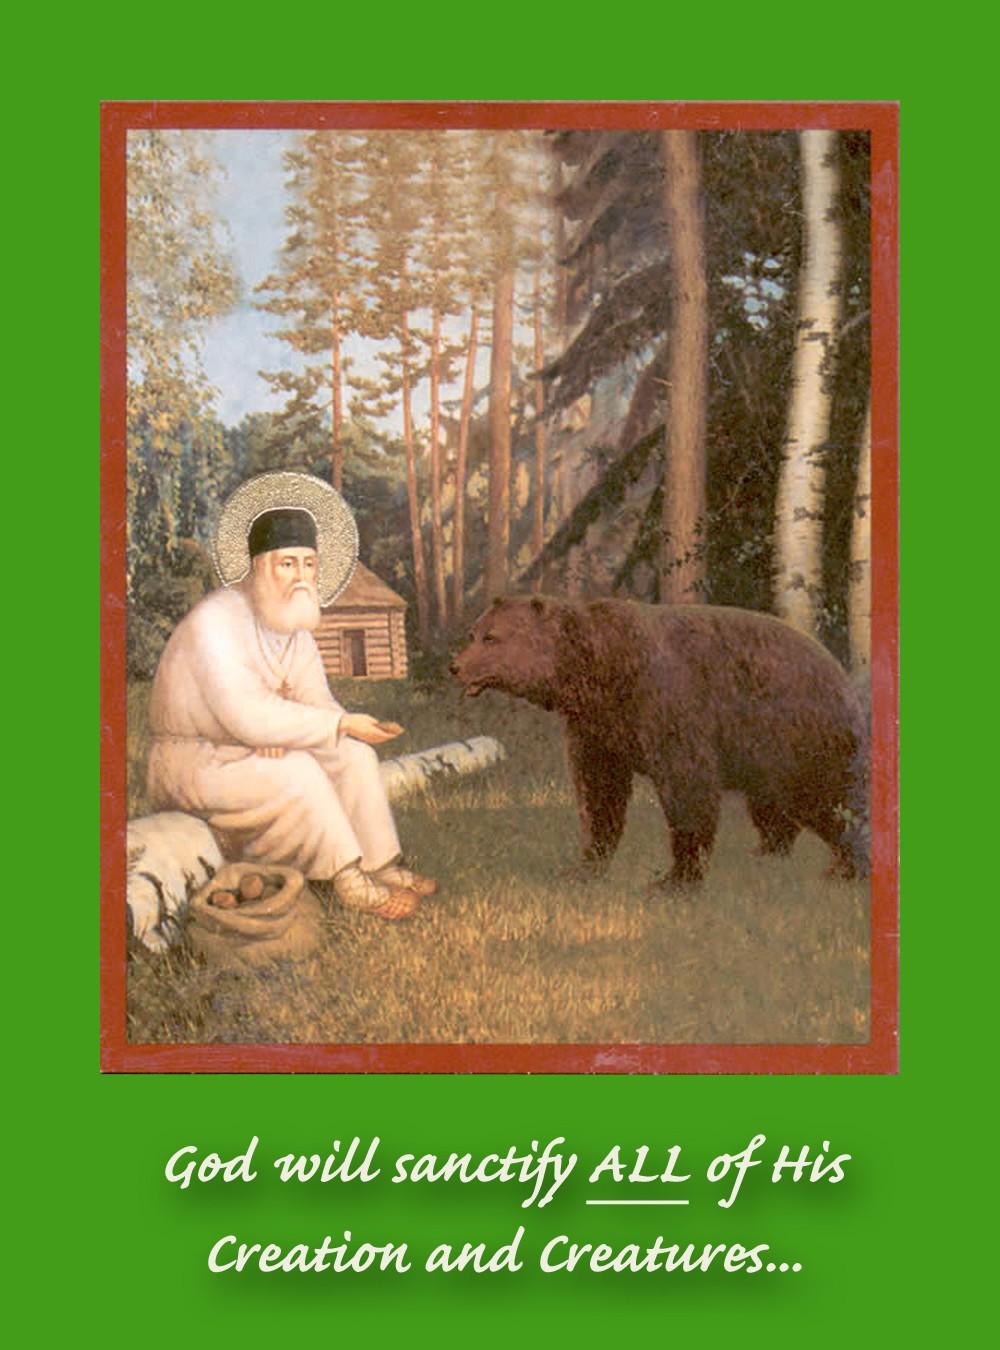 00 Unknown Artist. St Serafim Sarovsky and the Bear. 19th century.ALL Creation